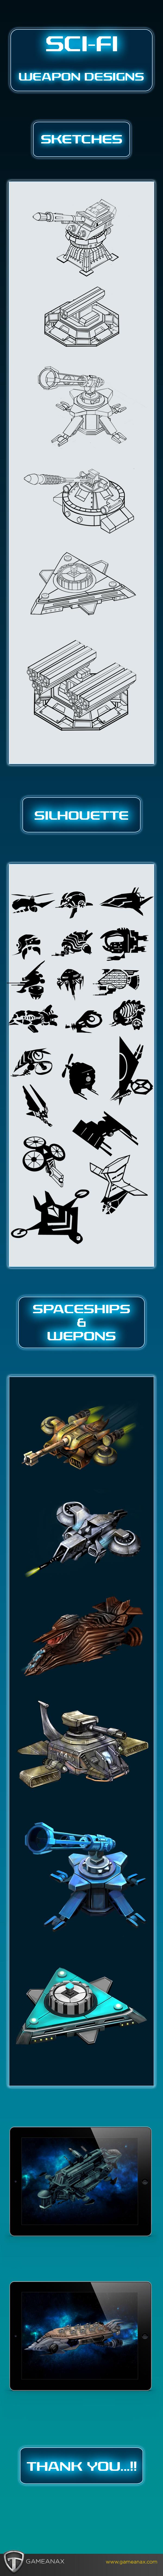 sci-fi sketches digital futuristic art graphics weapons futuristicweapons